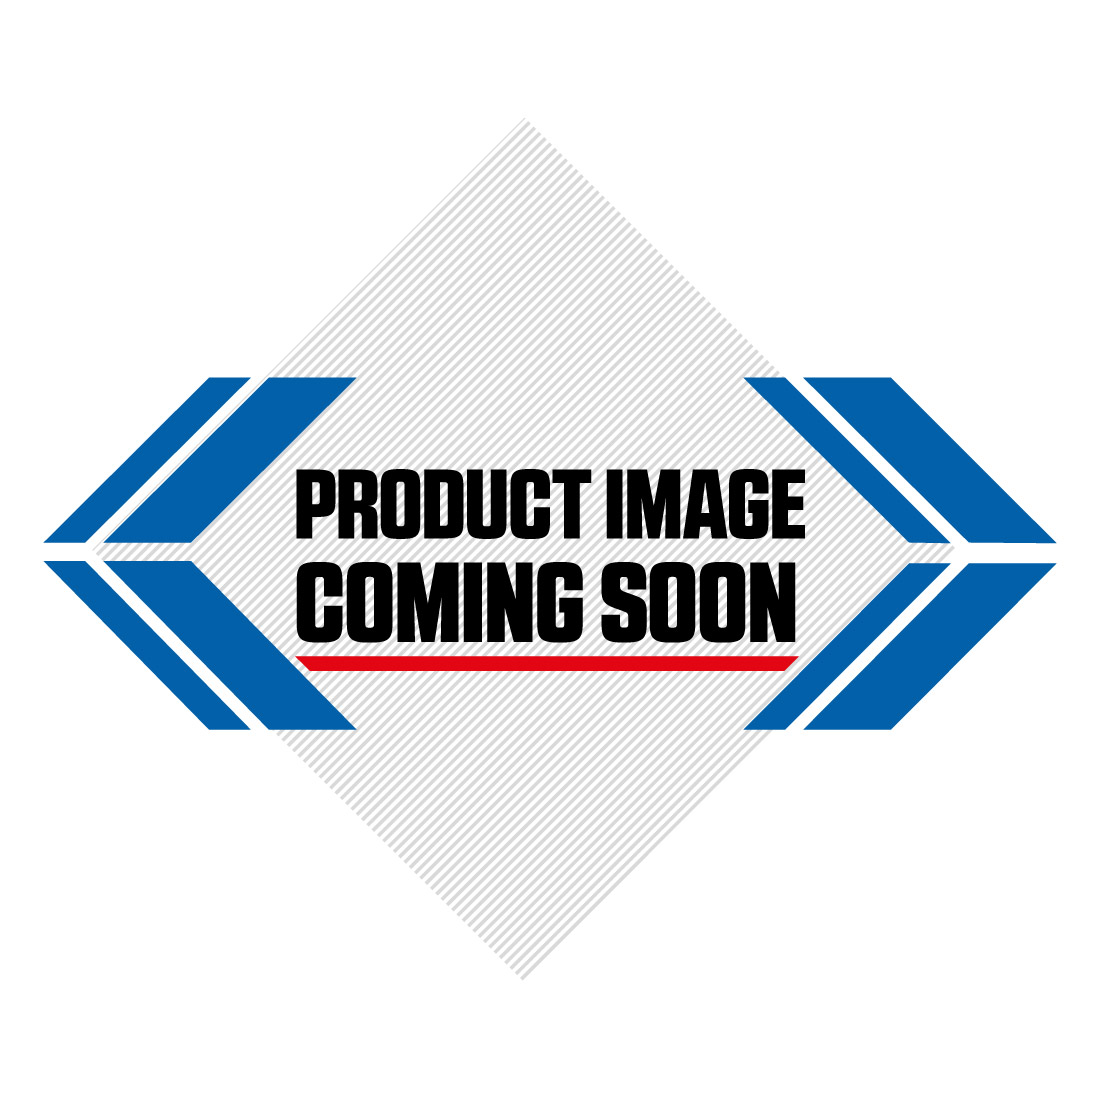 UFO KTM Plastic Kit SX 125 150 250 SXF 250 350 450 (16-18) OEM 16 Image-4>